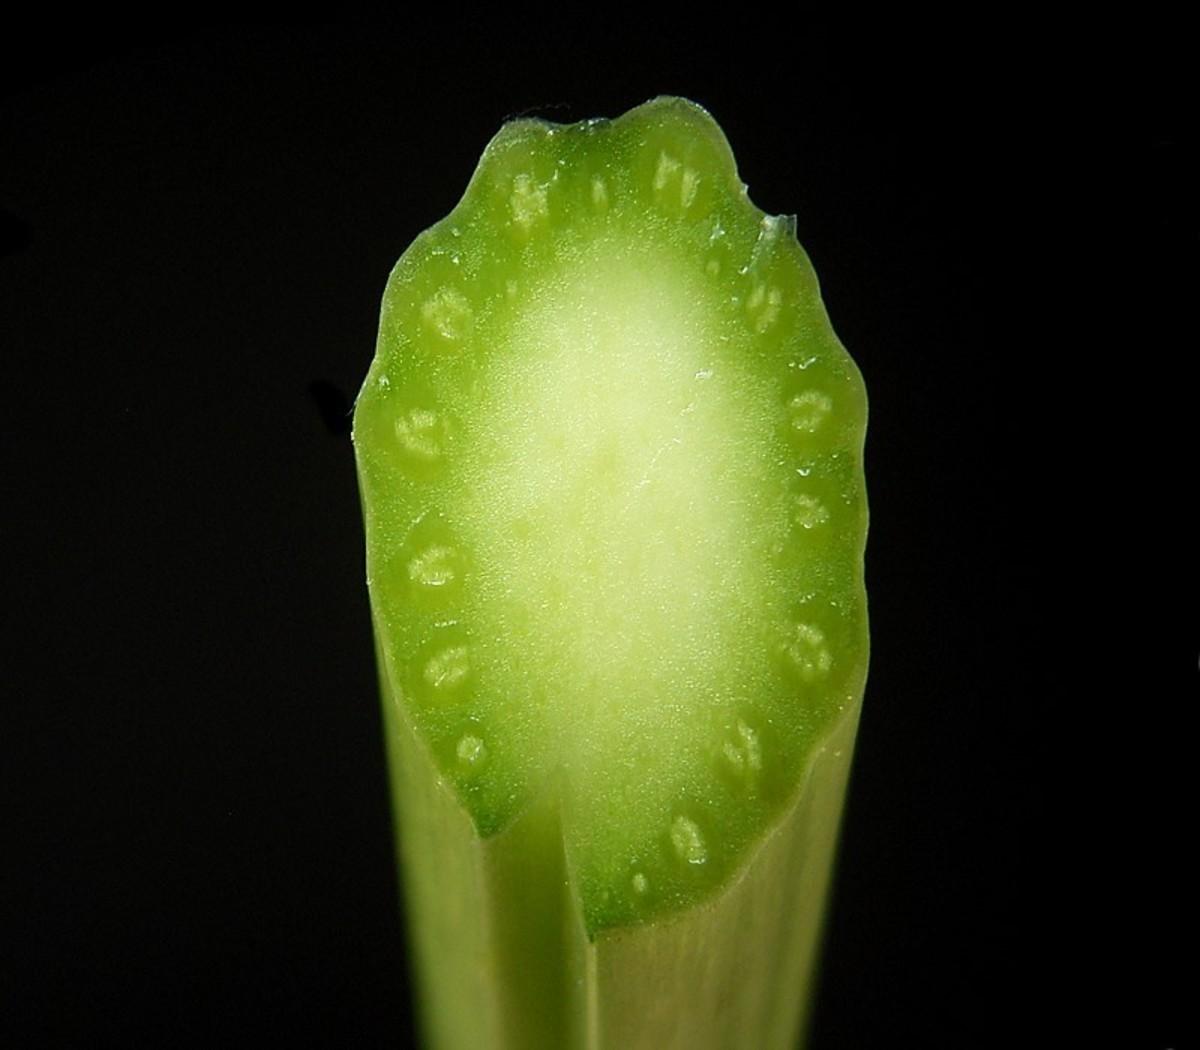 Cross Section Of The Horseradish Petiole (Leaf Stalk)